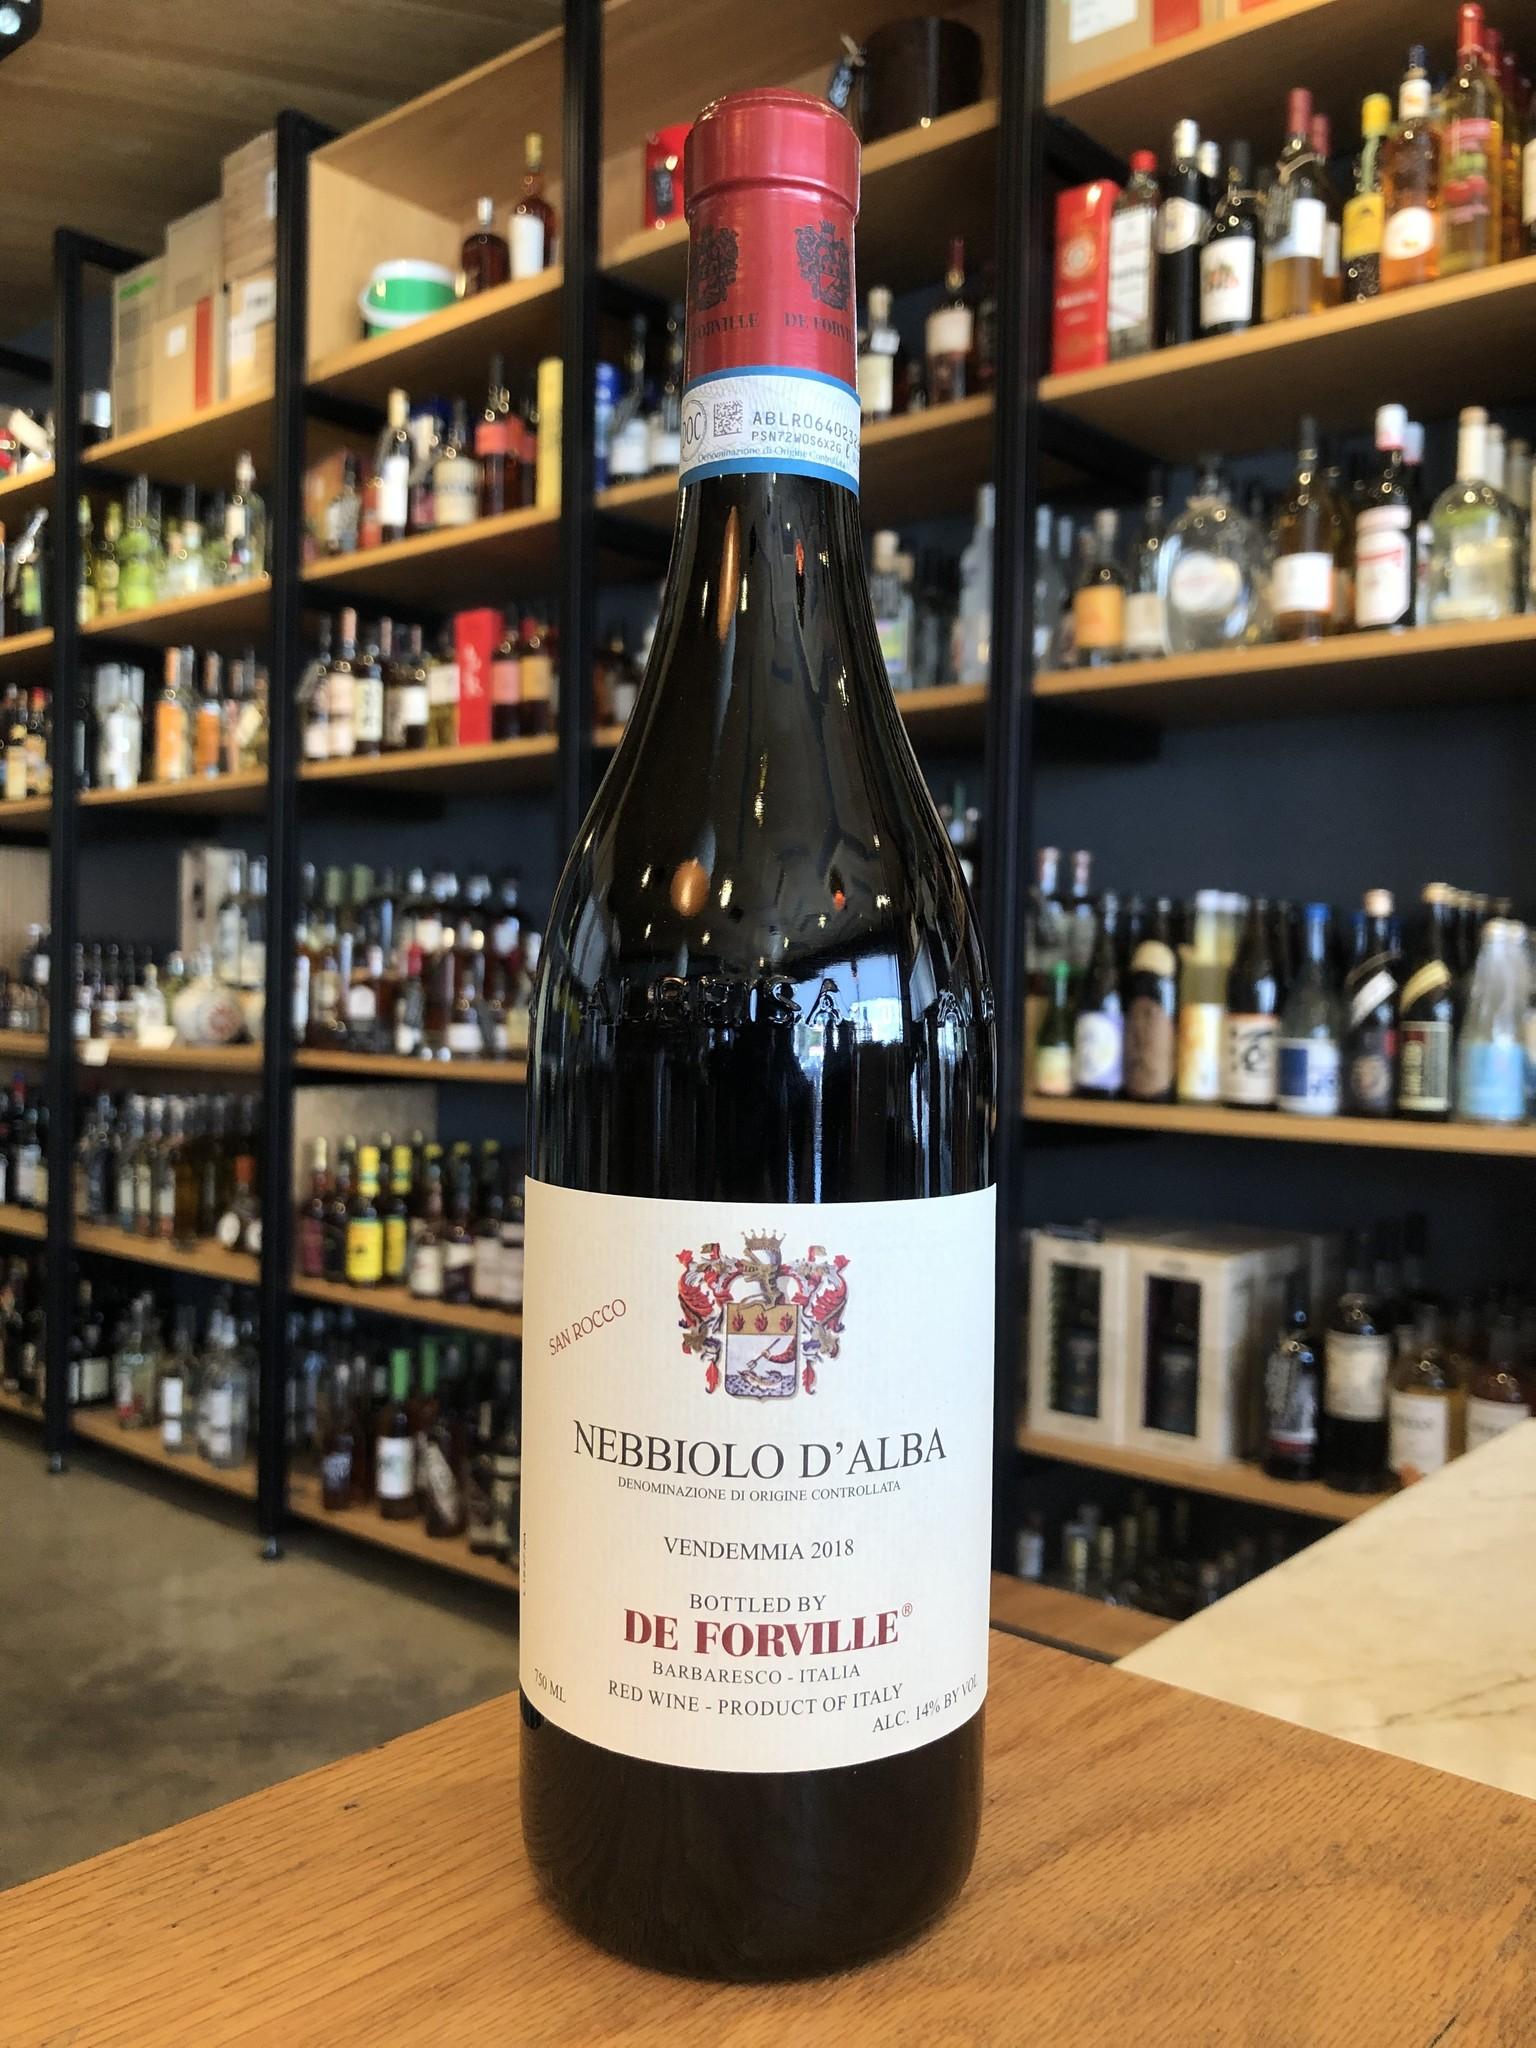 De Forville 2018 De Forville Nebbiolo D'Alba 'San Rocco' 750ml